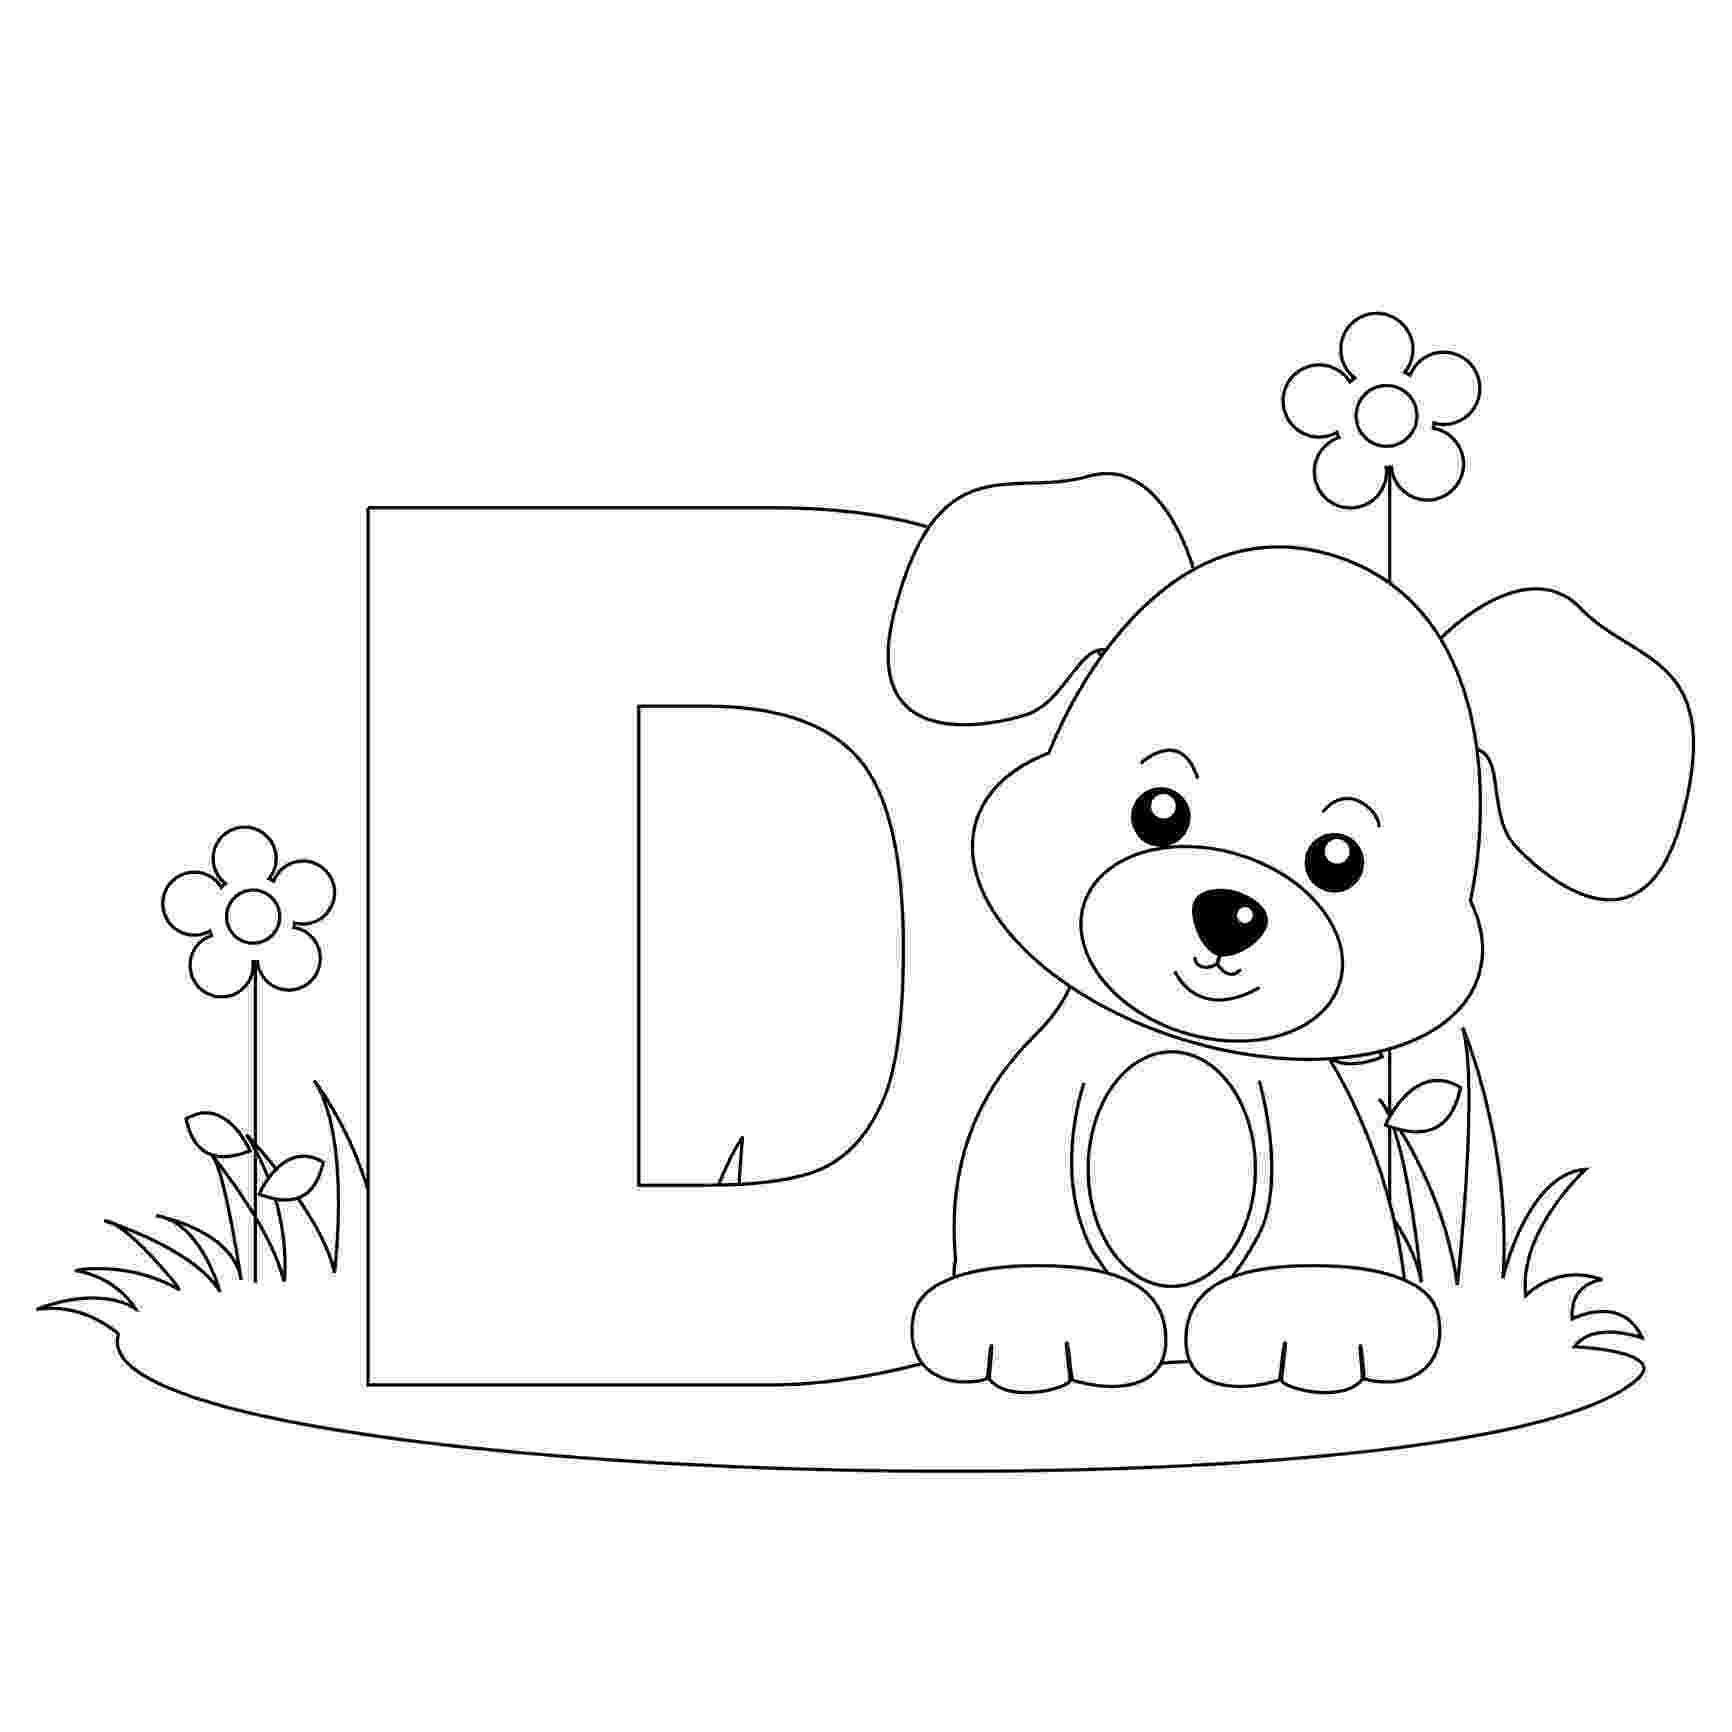 abc coloring sheets free printable alphabet coloring pages for kids best abc coloring sheets 1 2